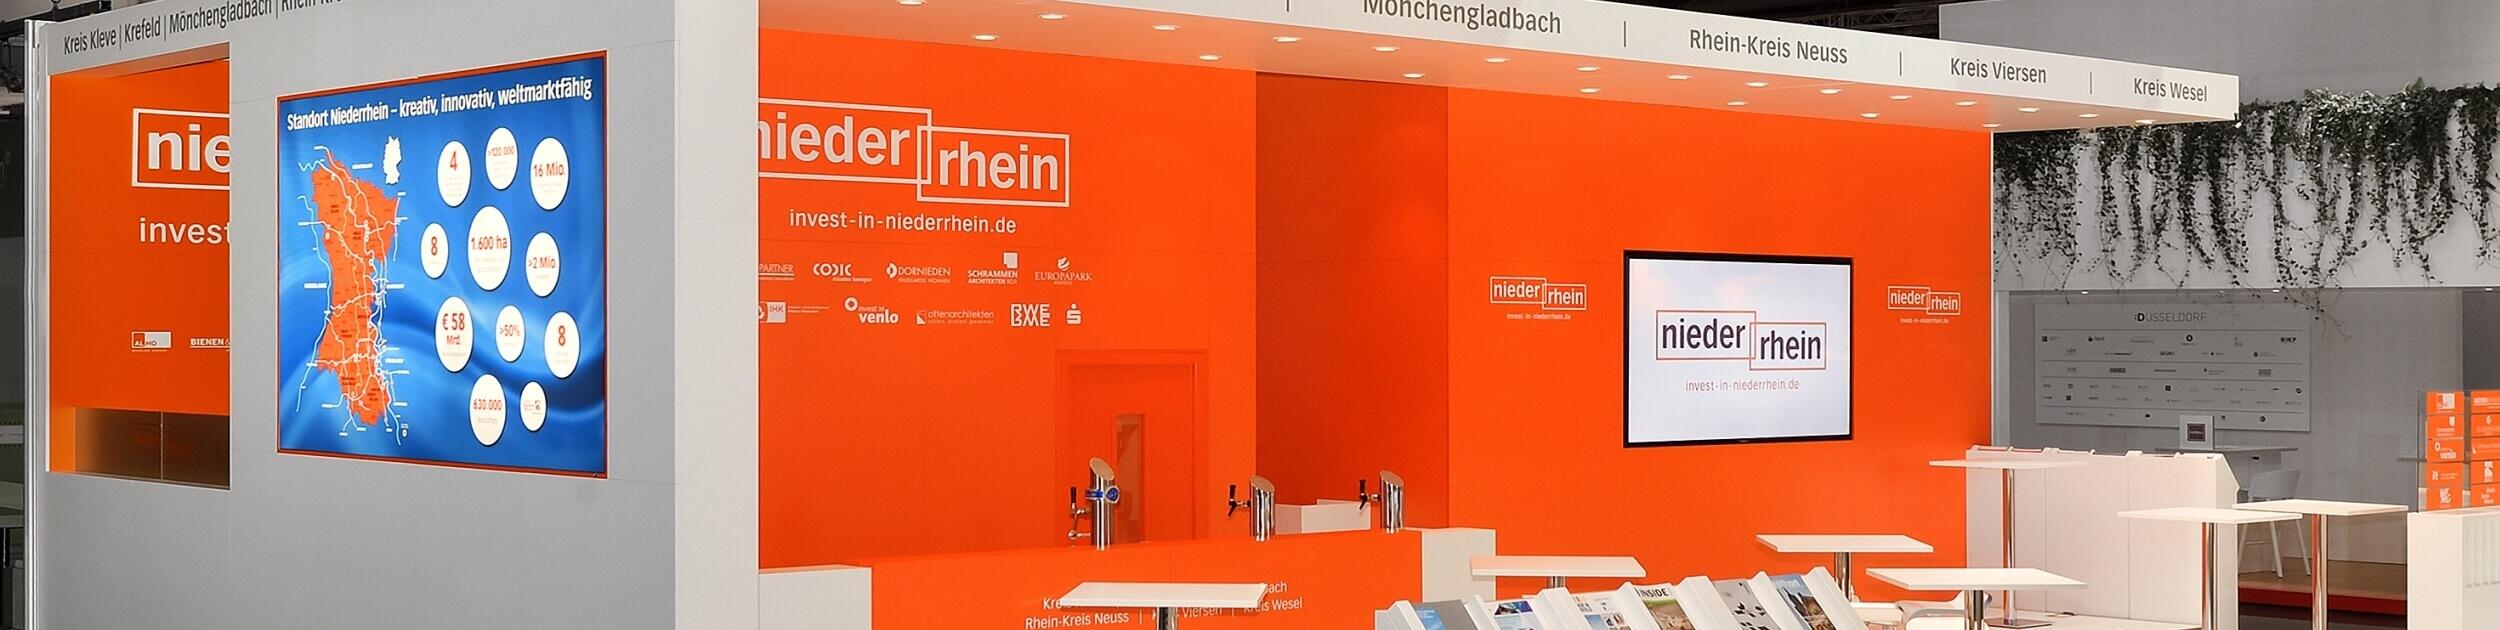 Messestand_Standort_Niederrhein_ExpoReal_Muenchen_ixpo_Messebau